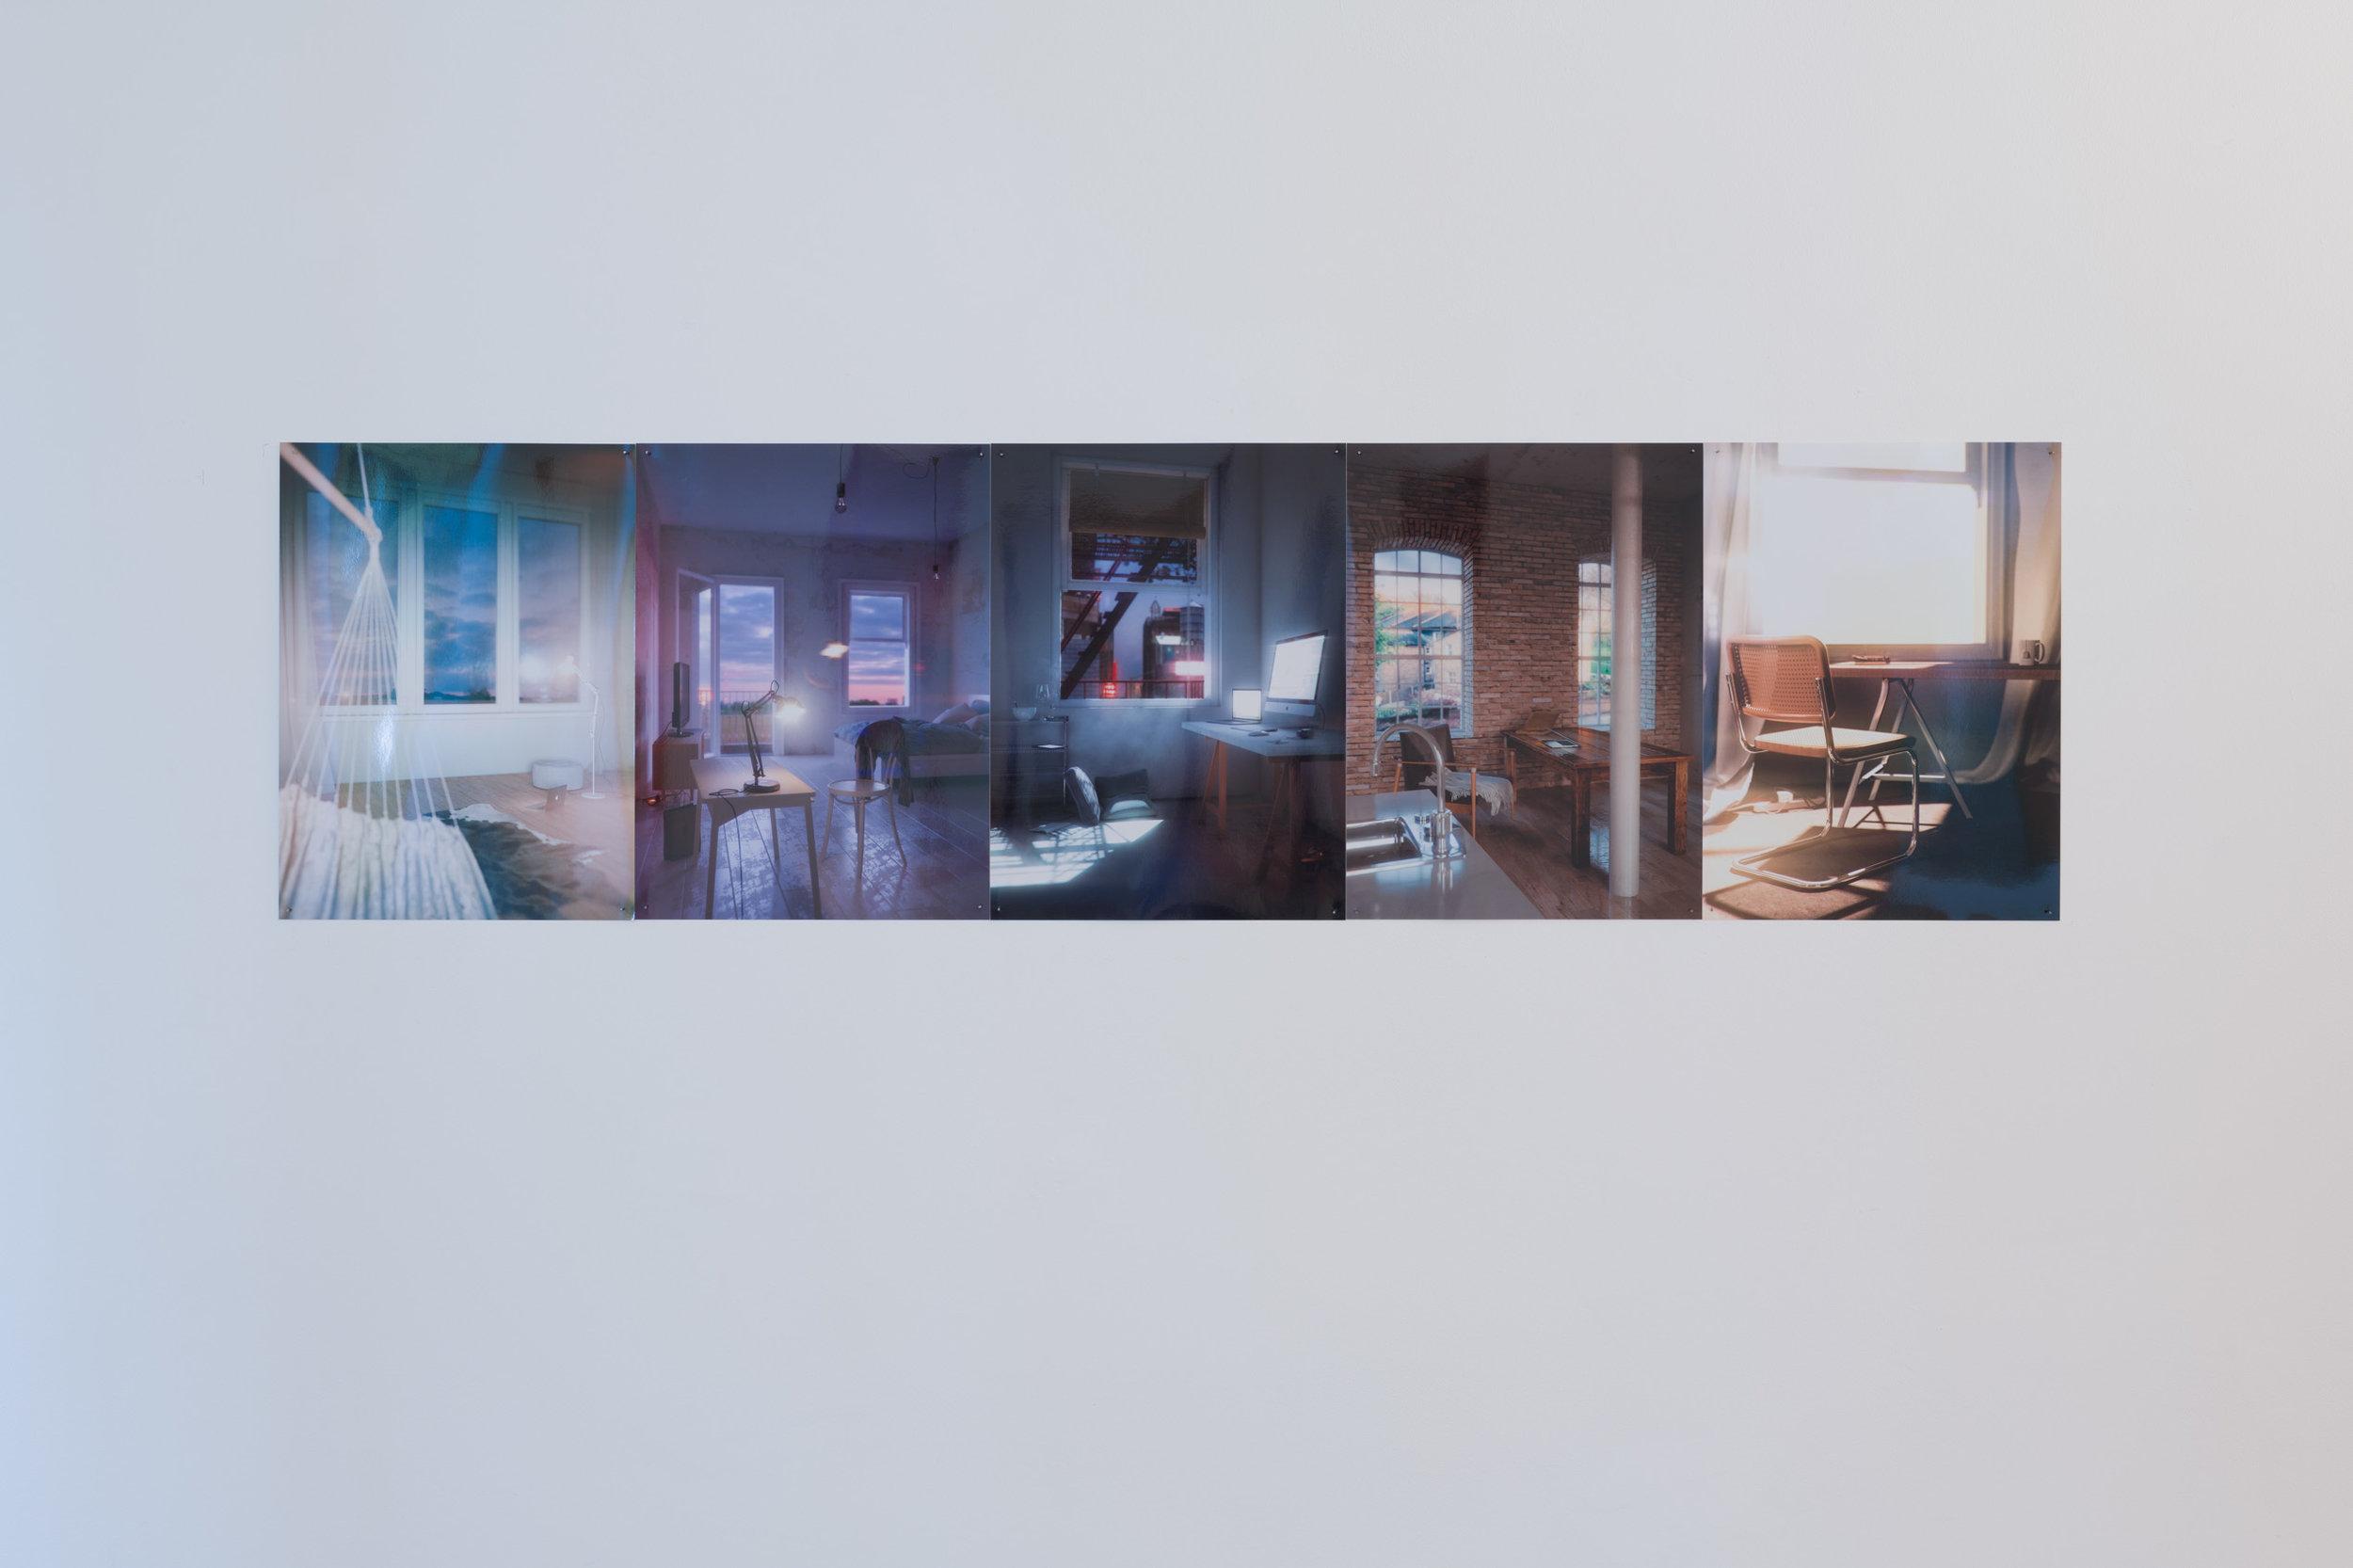 Malte Zander, Ohne Titel (Sublets 1 - 5), 2019